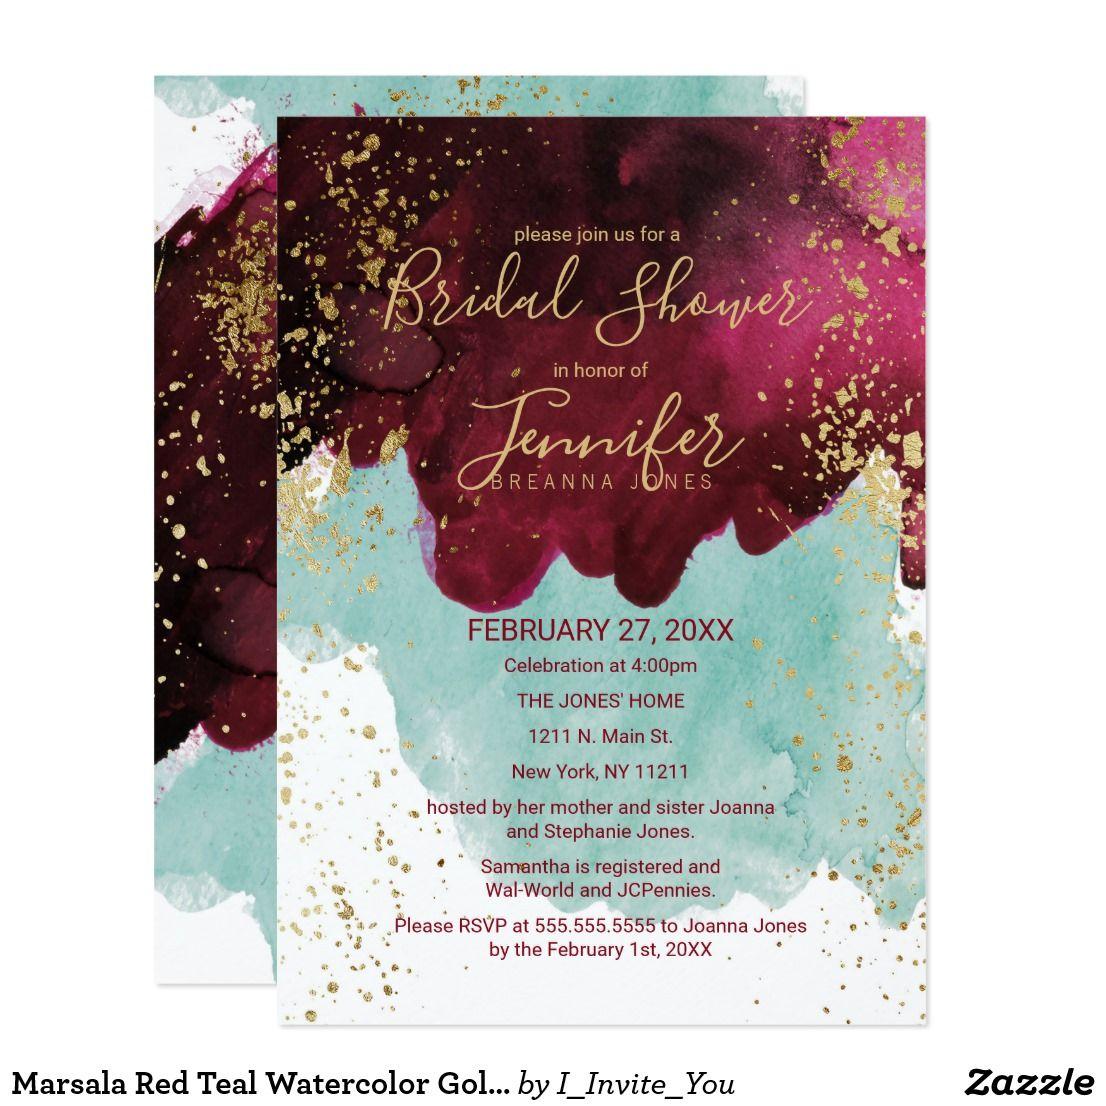 Marsala Red Teal Watercolor Gold Bridal Shower Invitation ...